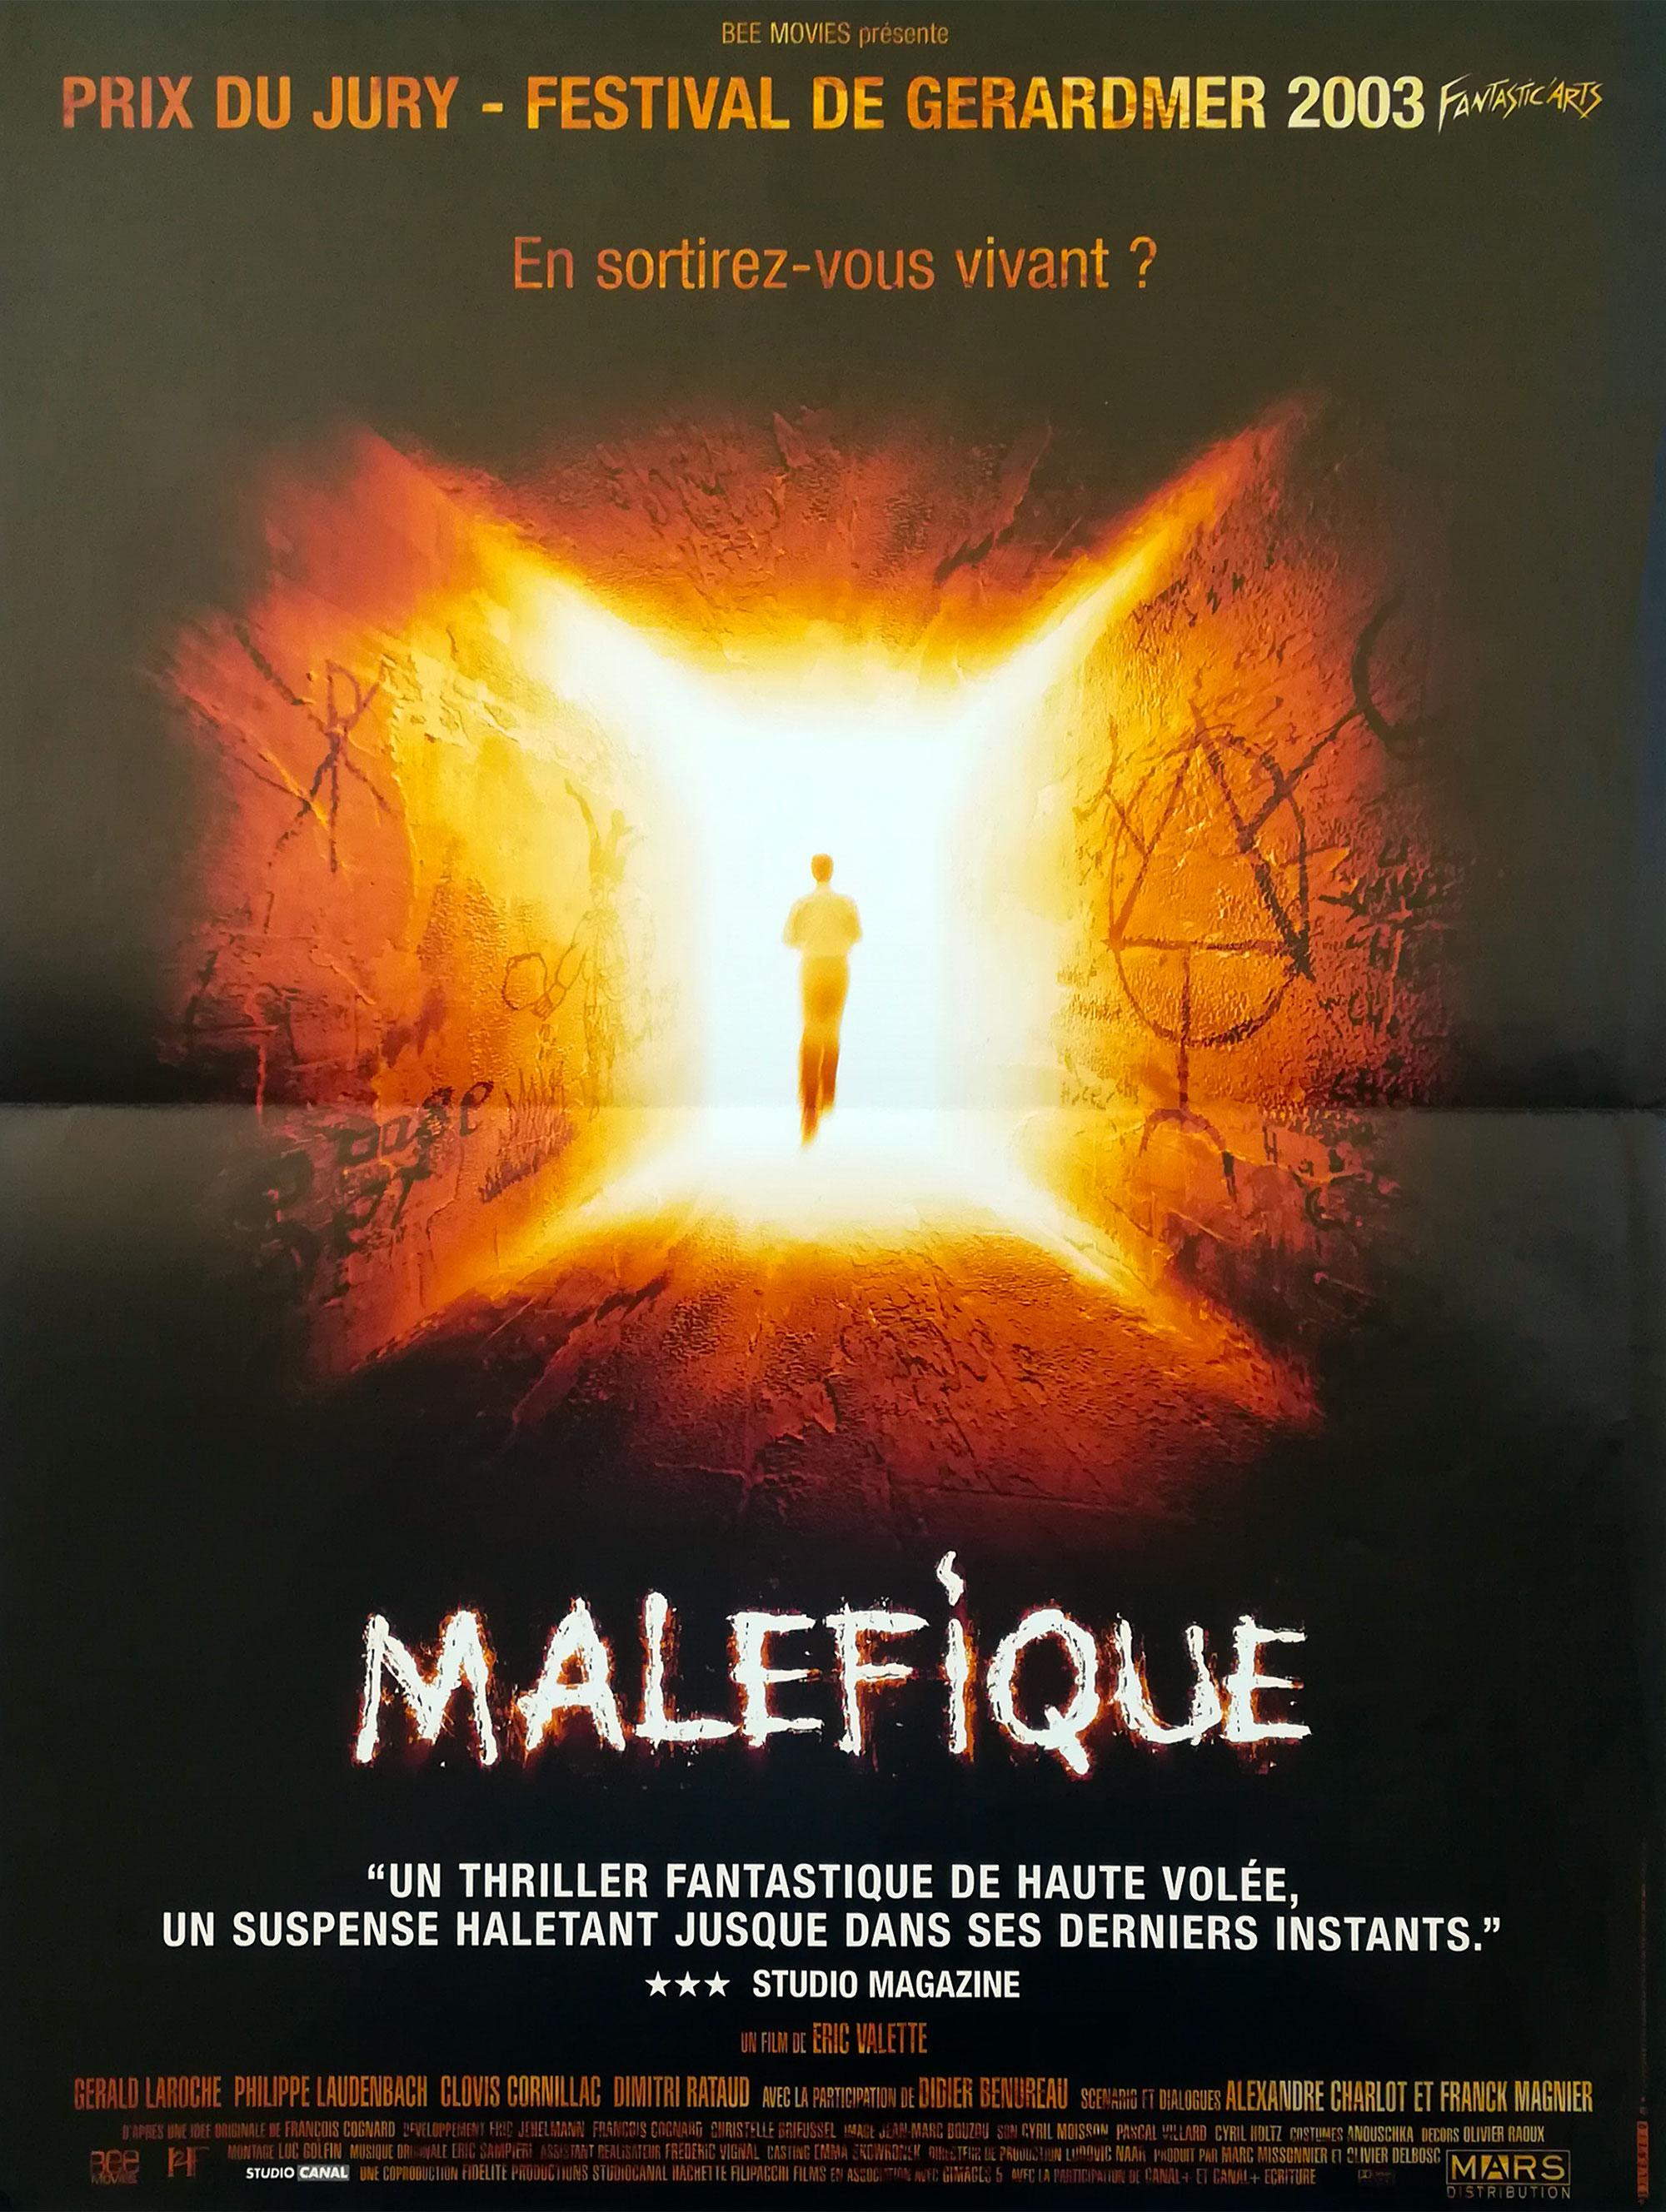 Maleficent Original Movie Poster 15x21 In 2014 Robert Stromberg Angelina Jolie